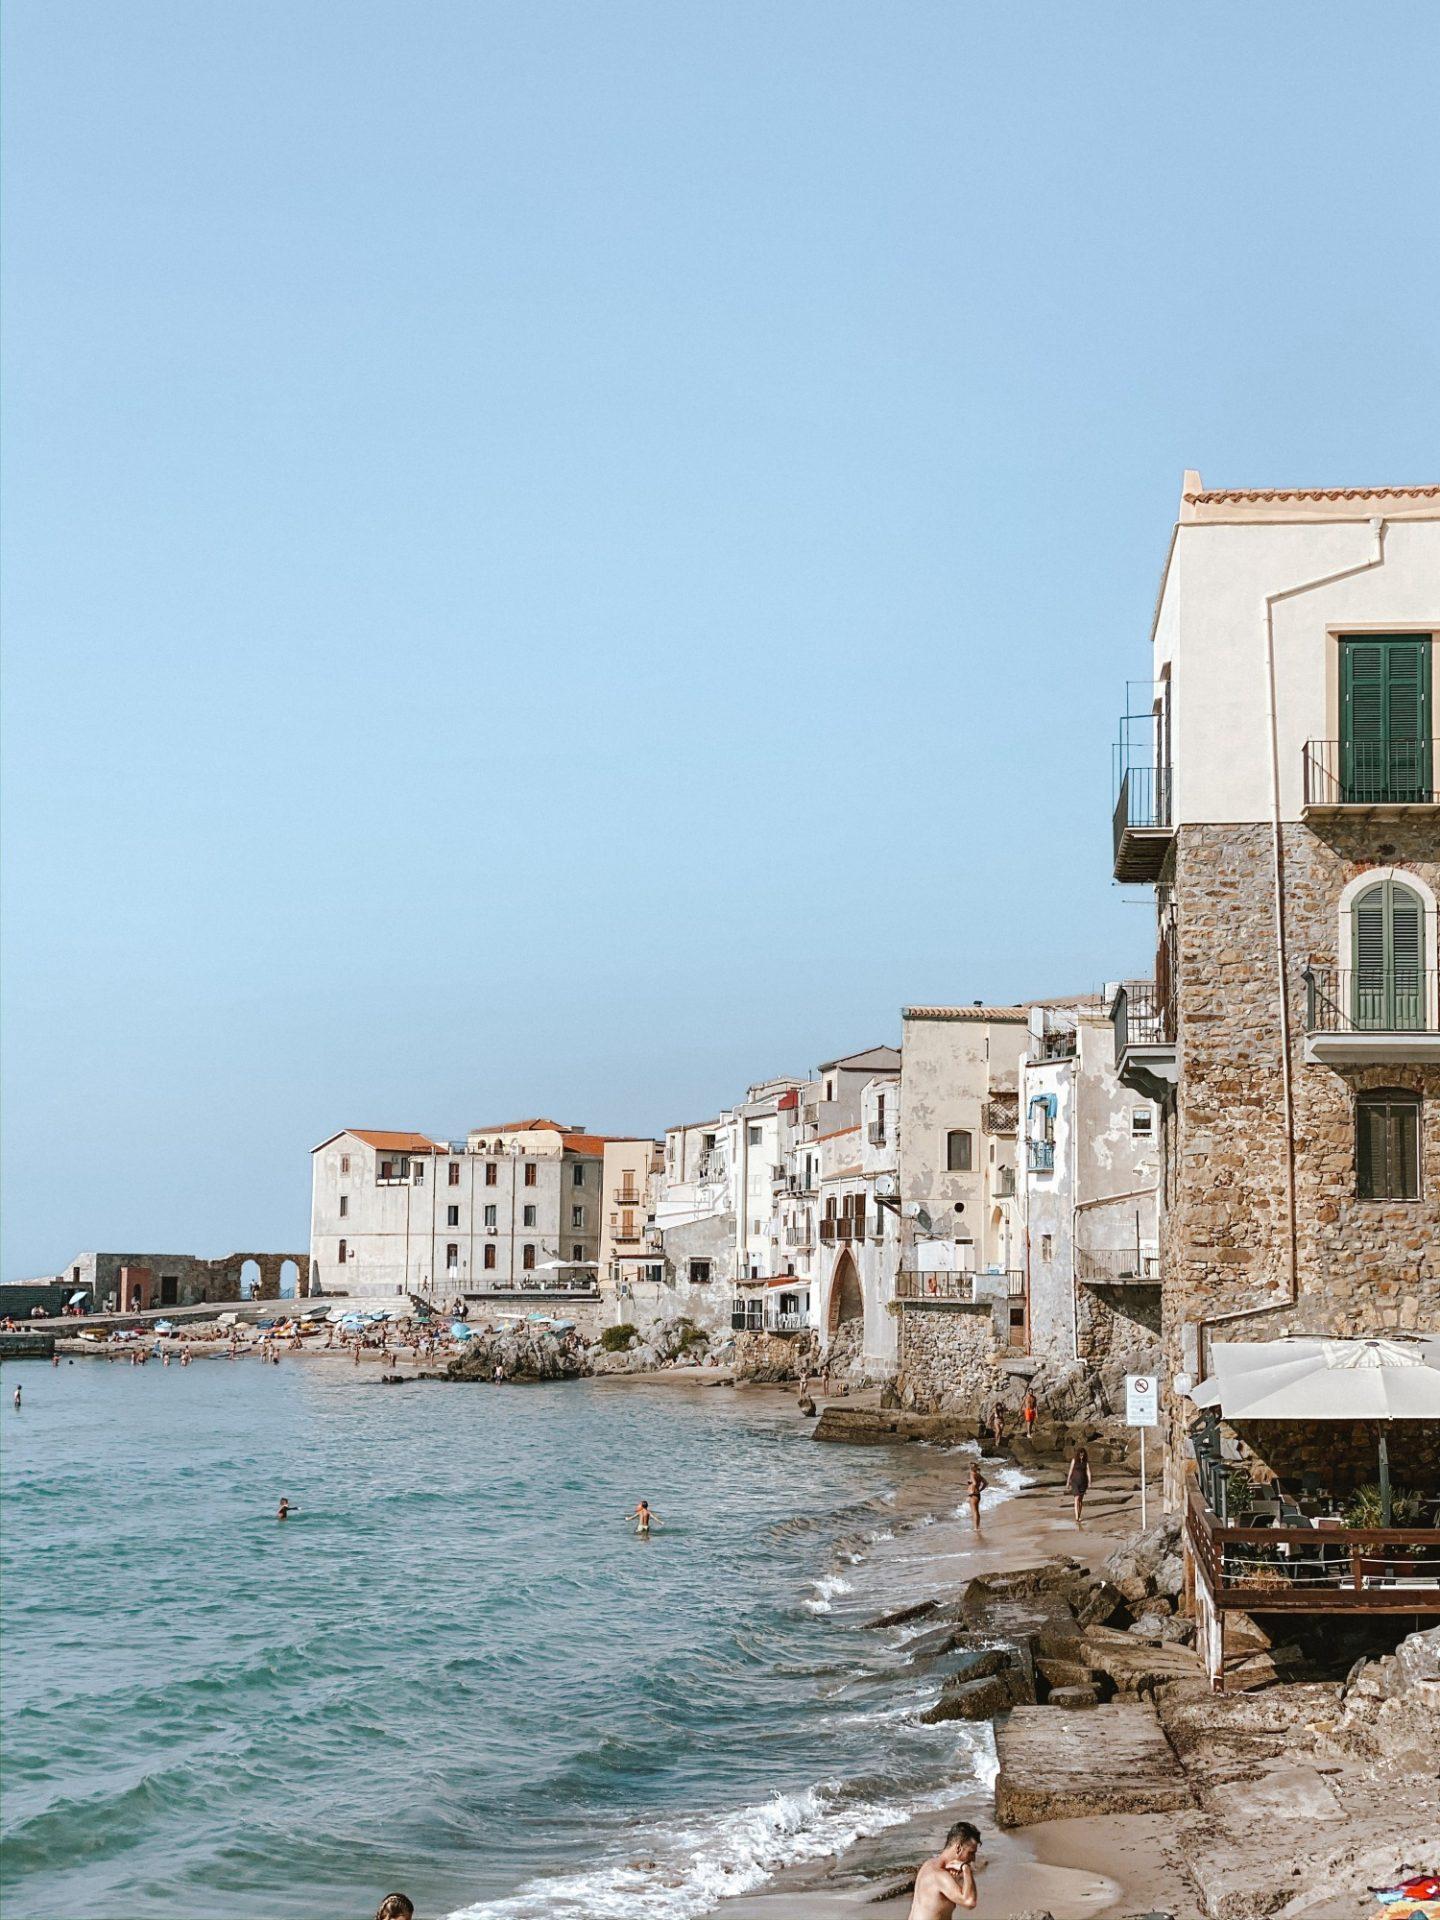 Visiter Cefalu Sicile - Blondie Baby blog voyages